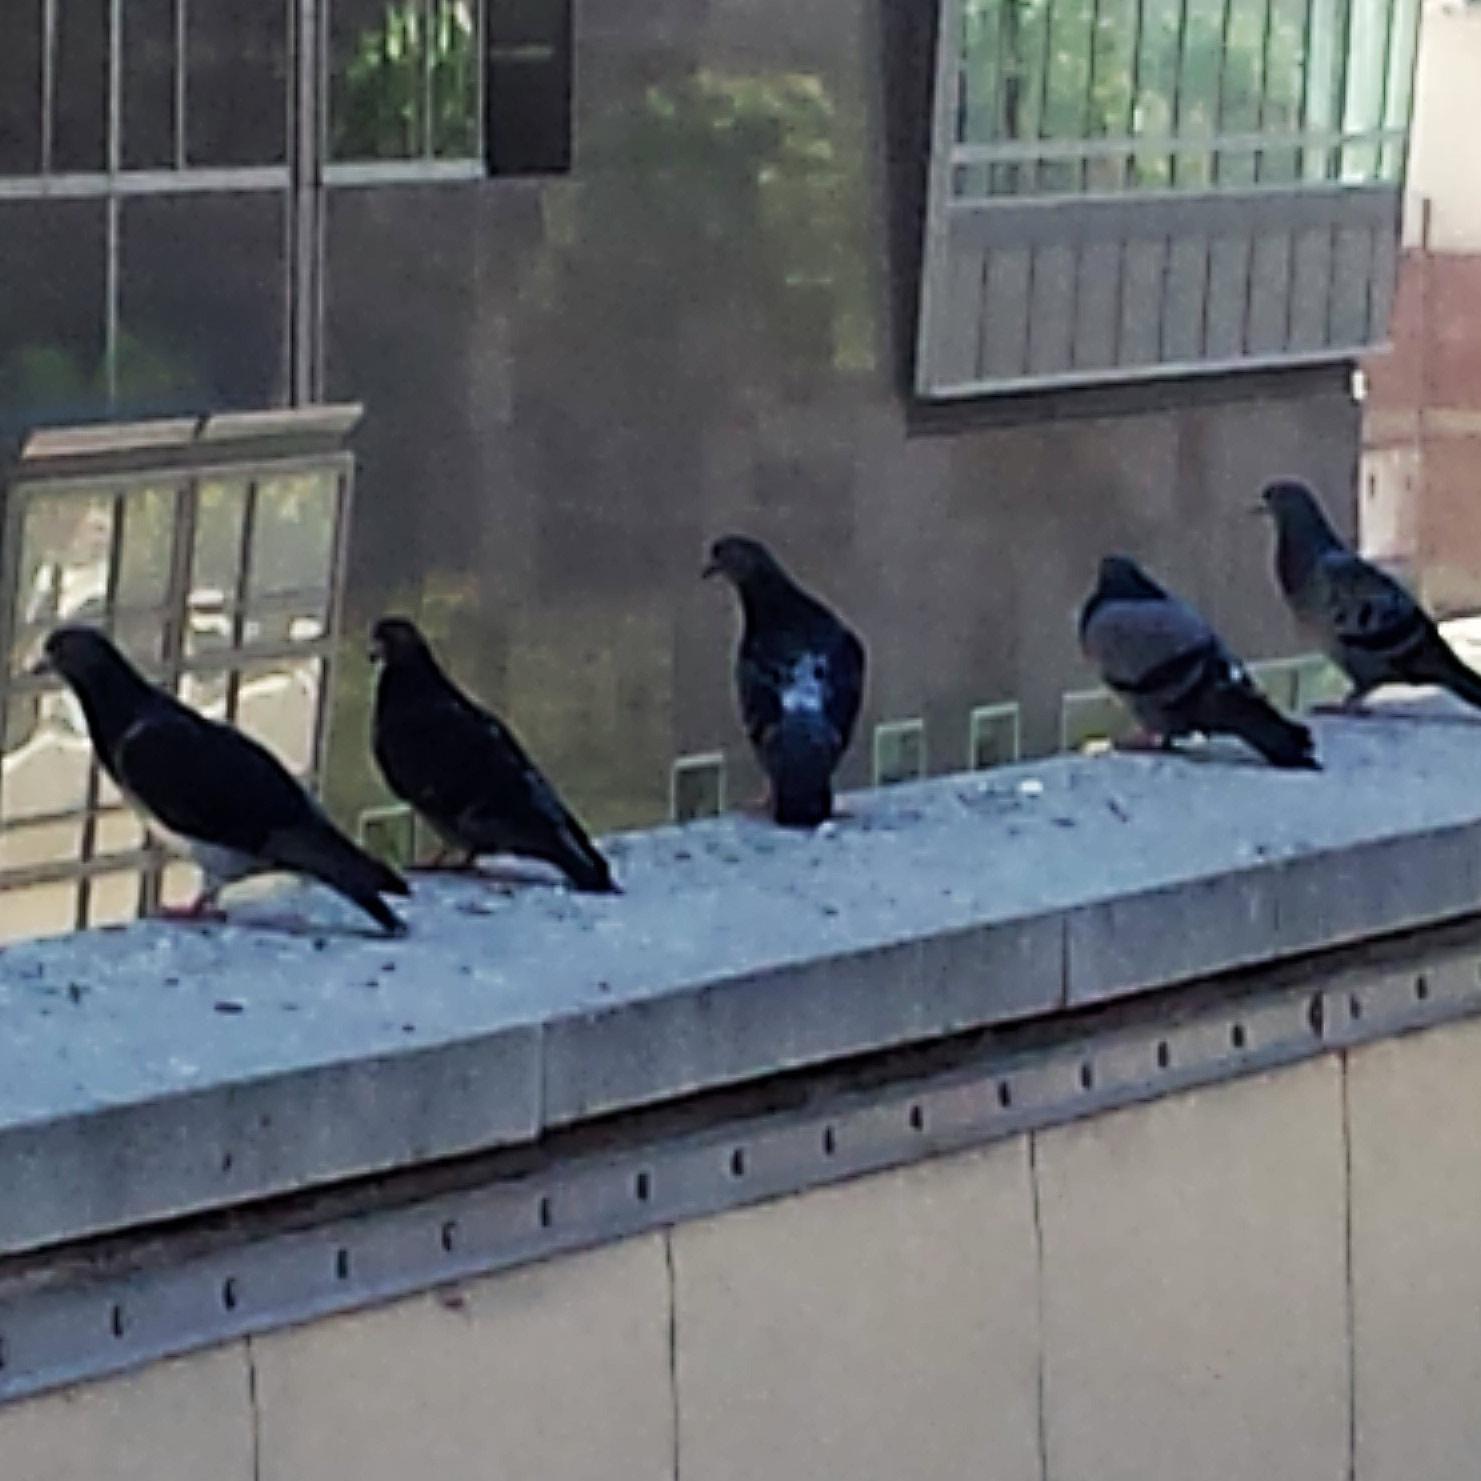 Birds lining up